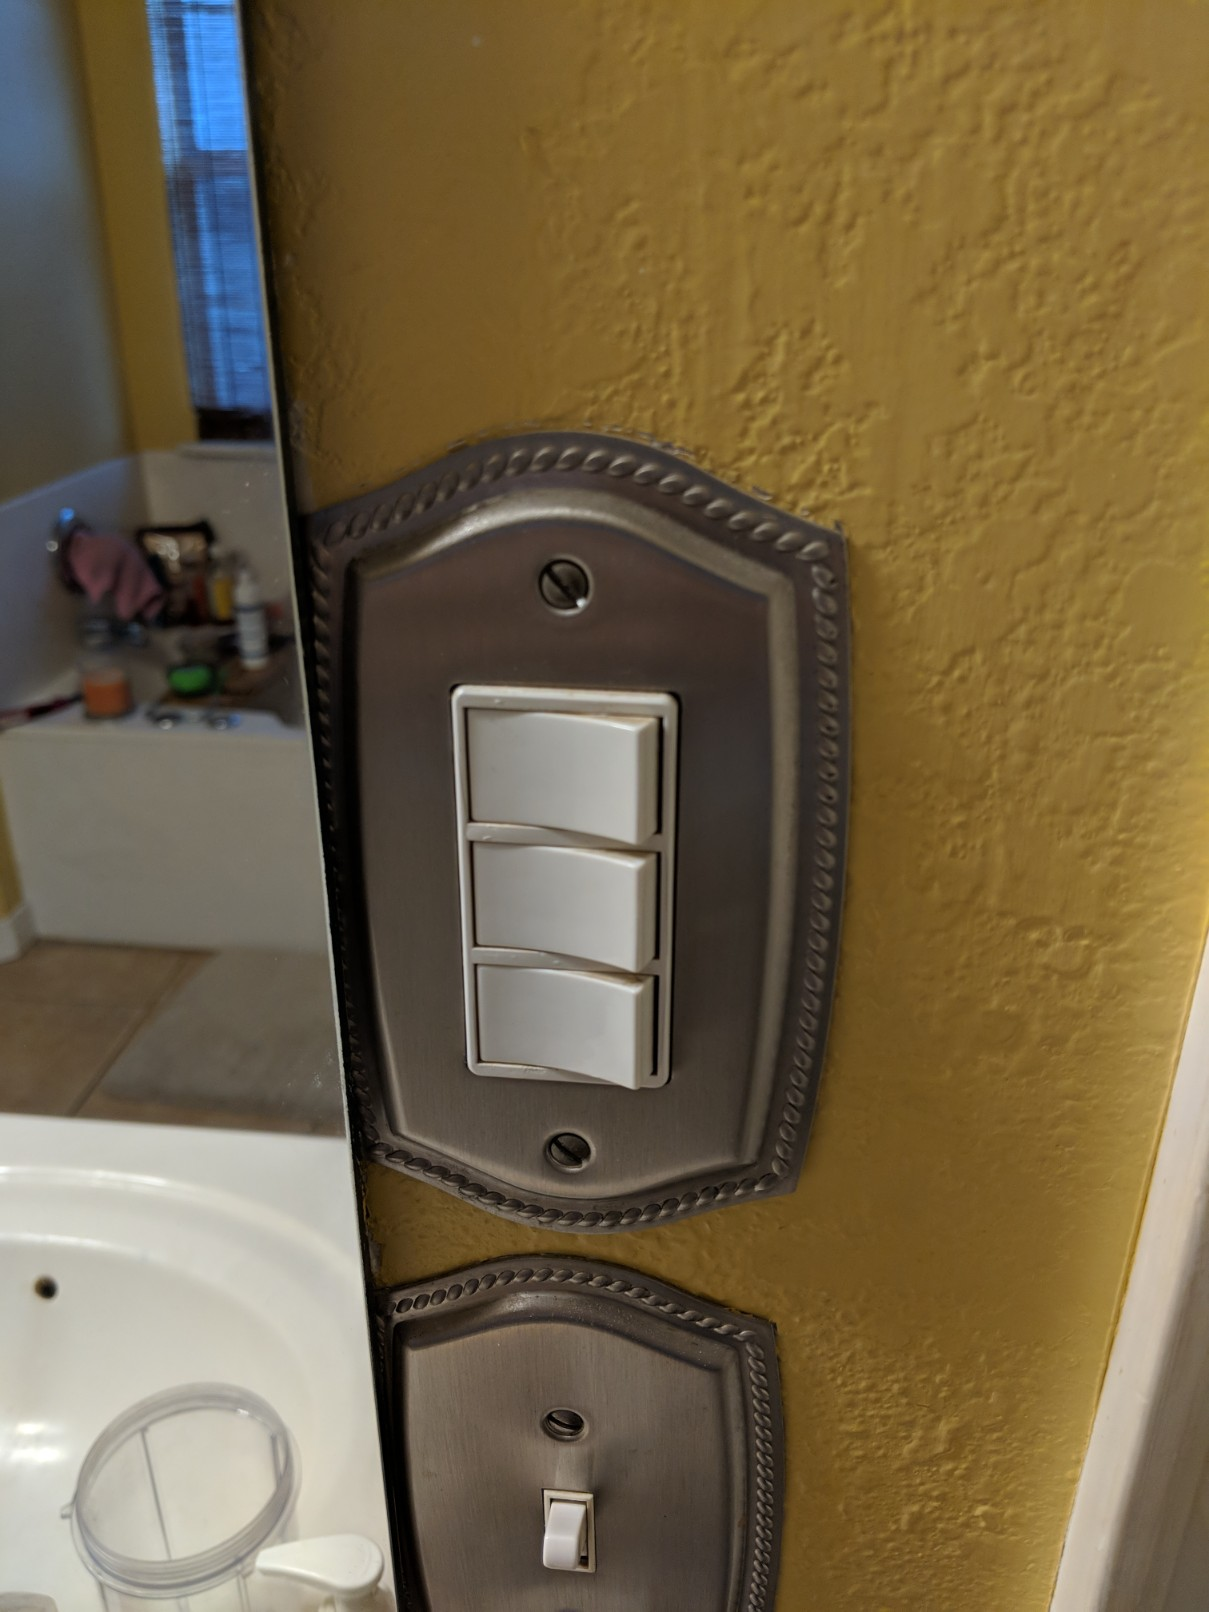 Light Wiring Diagram Also Bathroom Exhaust Fan Vents Also Bathroom Fan